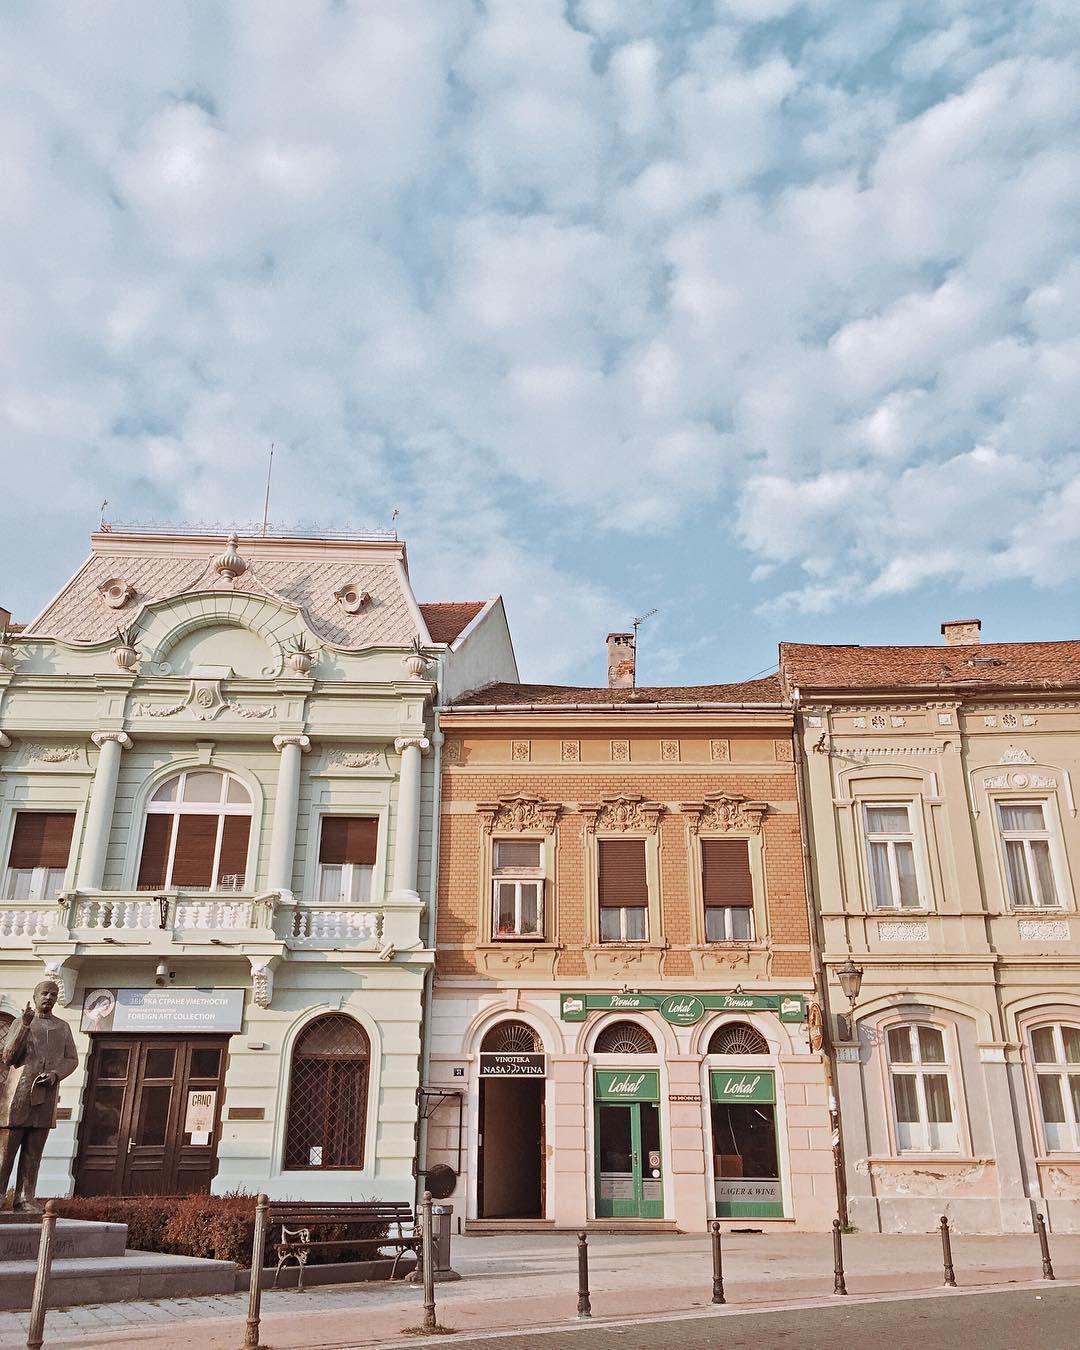 "MAJA on Instagram: ""🍂🍁 #fall #novosadski • • • • • • • • • • • • •  #inlove #enjoy #life #lovely #view #vsco #novisad #photooftheday #photo #beauty #vscocam…"""